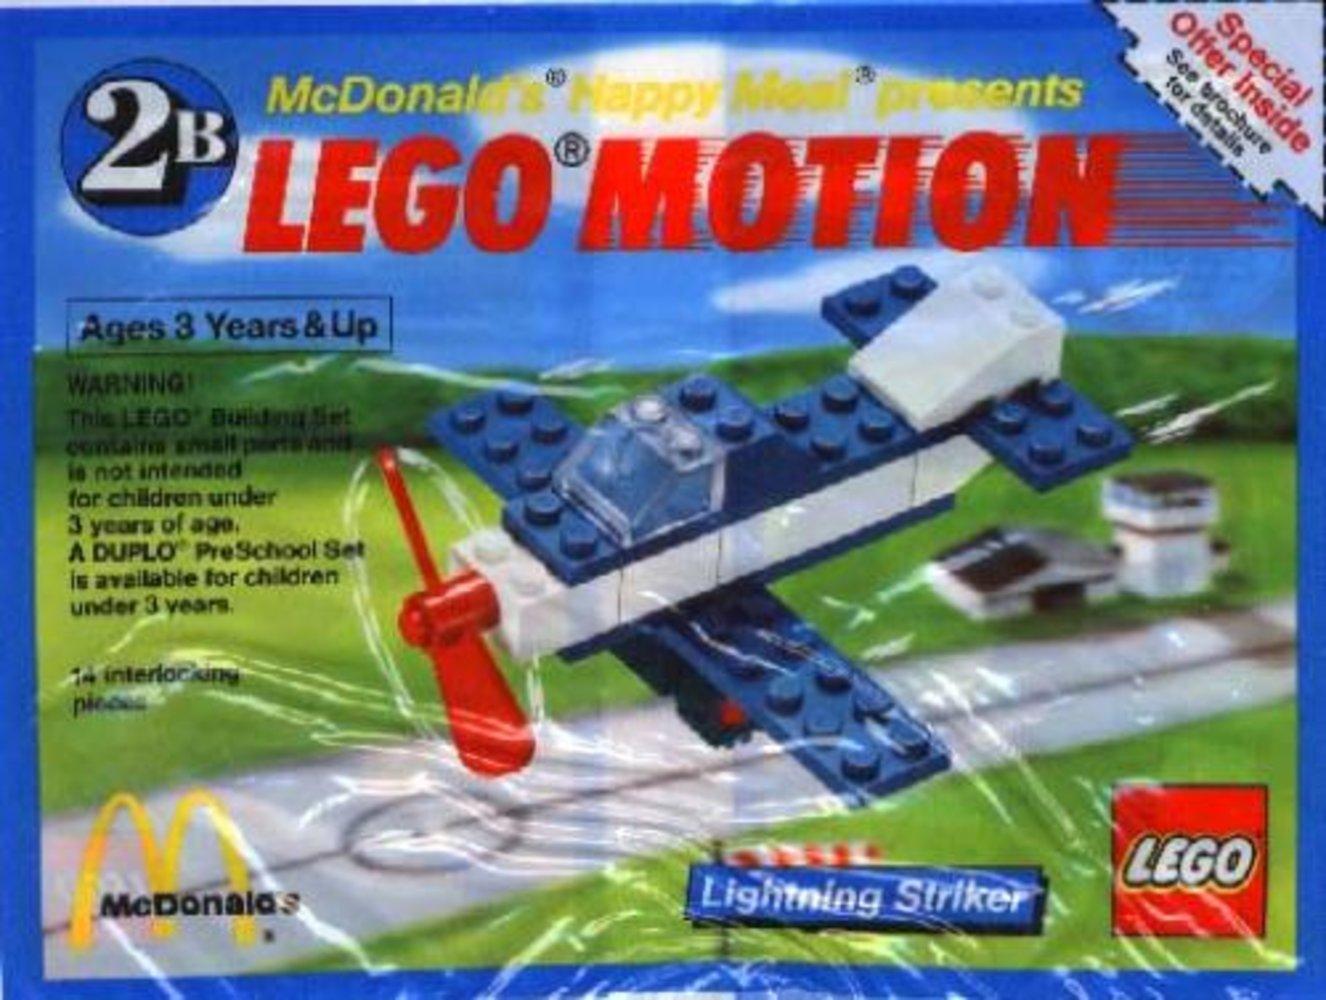 Lego Motion 2B, Lightning Striker